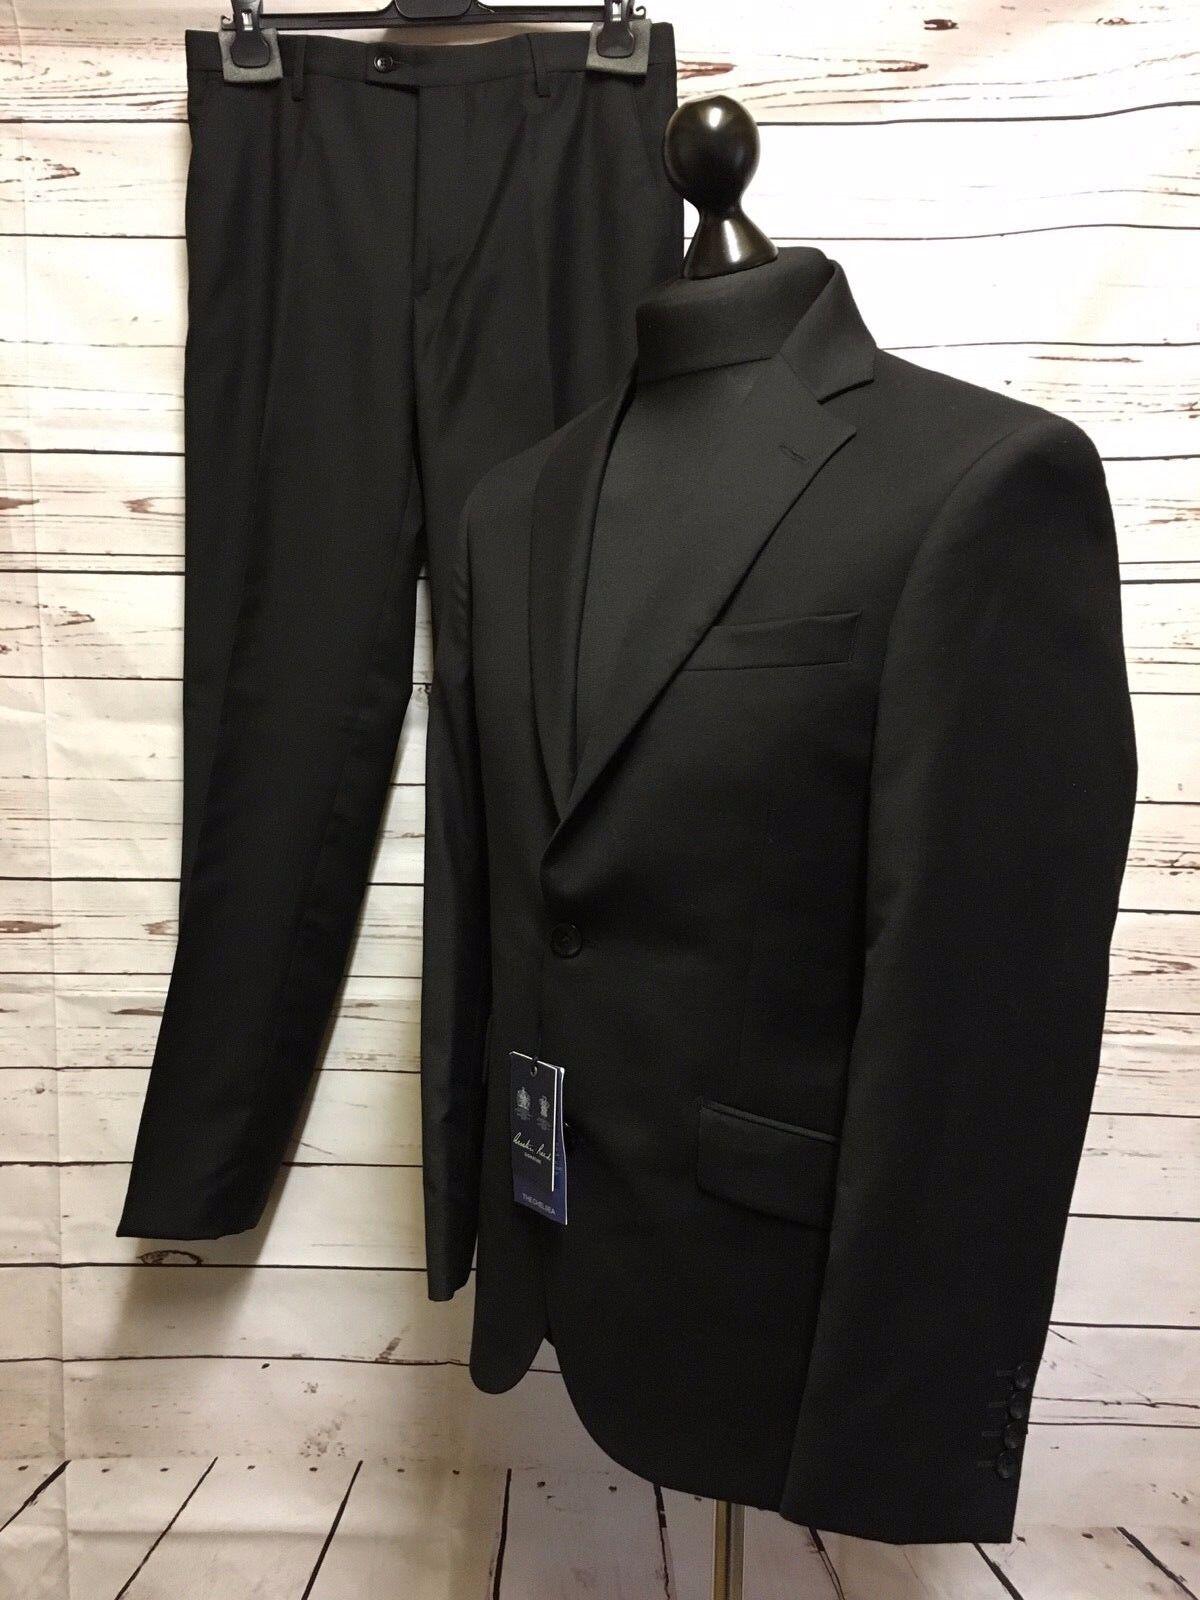 Austin Reed Mens The Chelsea Black Suit Jacket 38 Reg Trousers 32 Reg For Sale Online Ebay